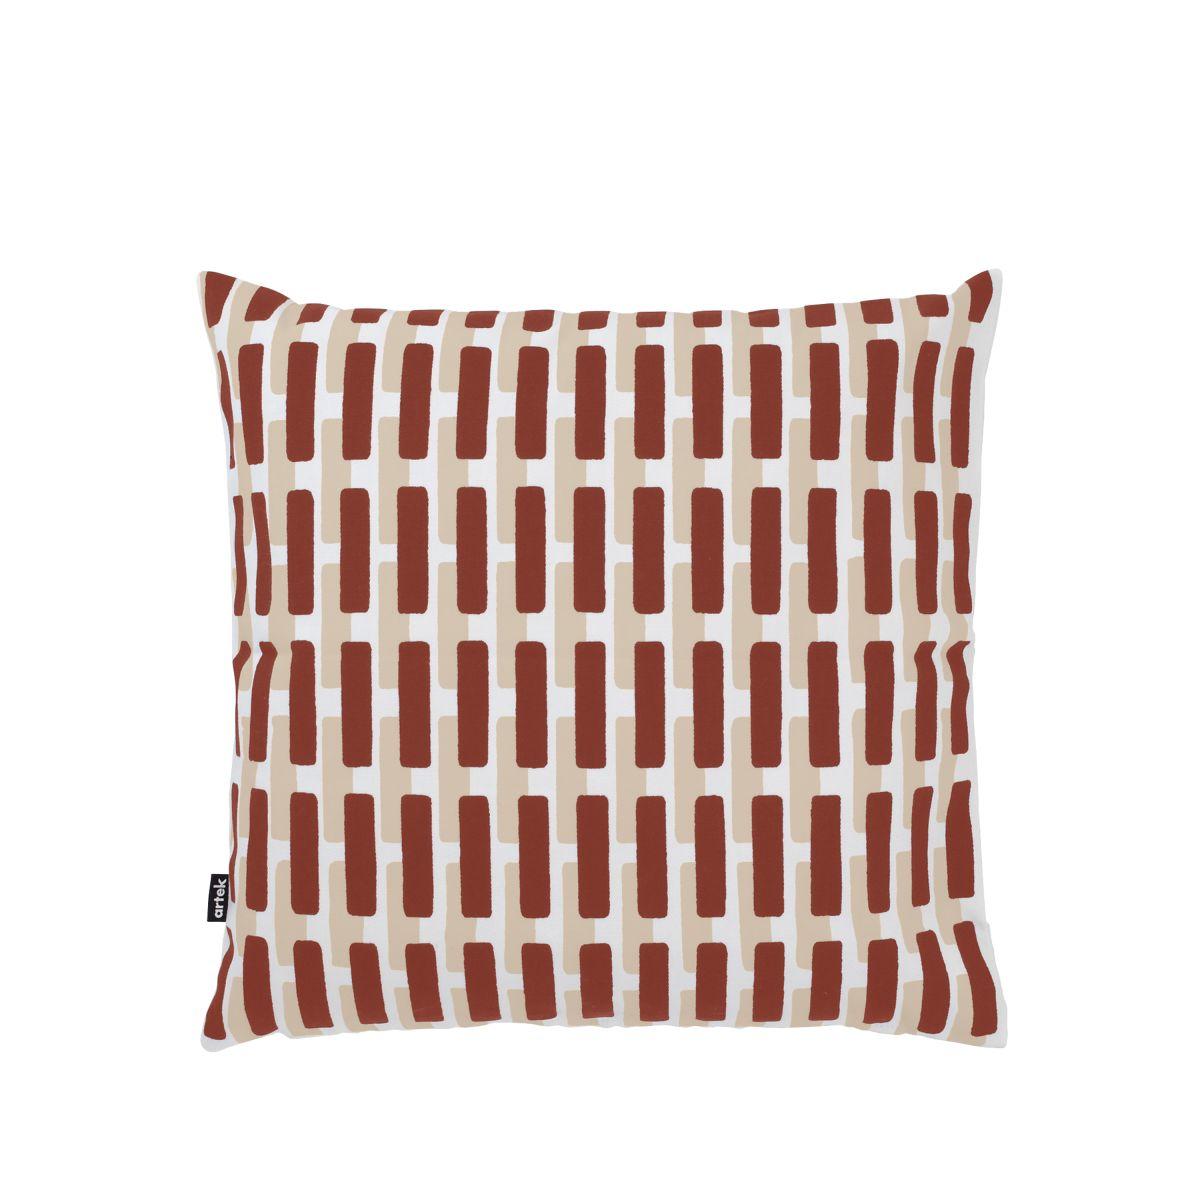 Siena-Cushion-Cover-Cotton-Canvas-small-40-x-40-cm-brick-sand-shadow-3976673